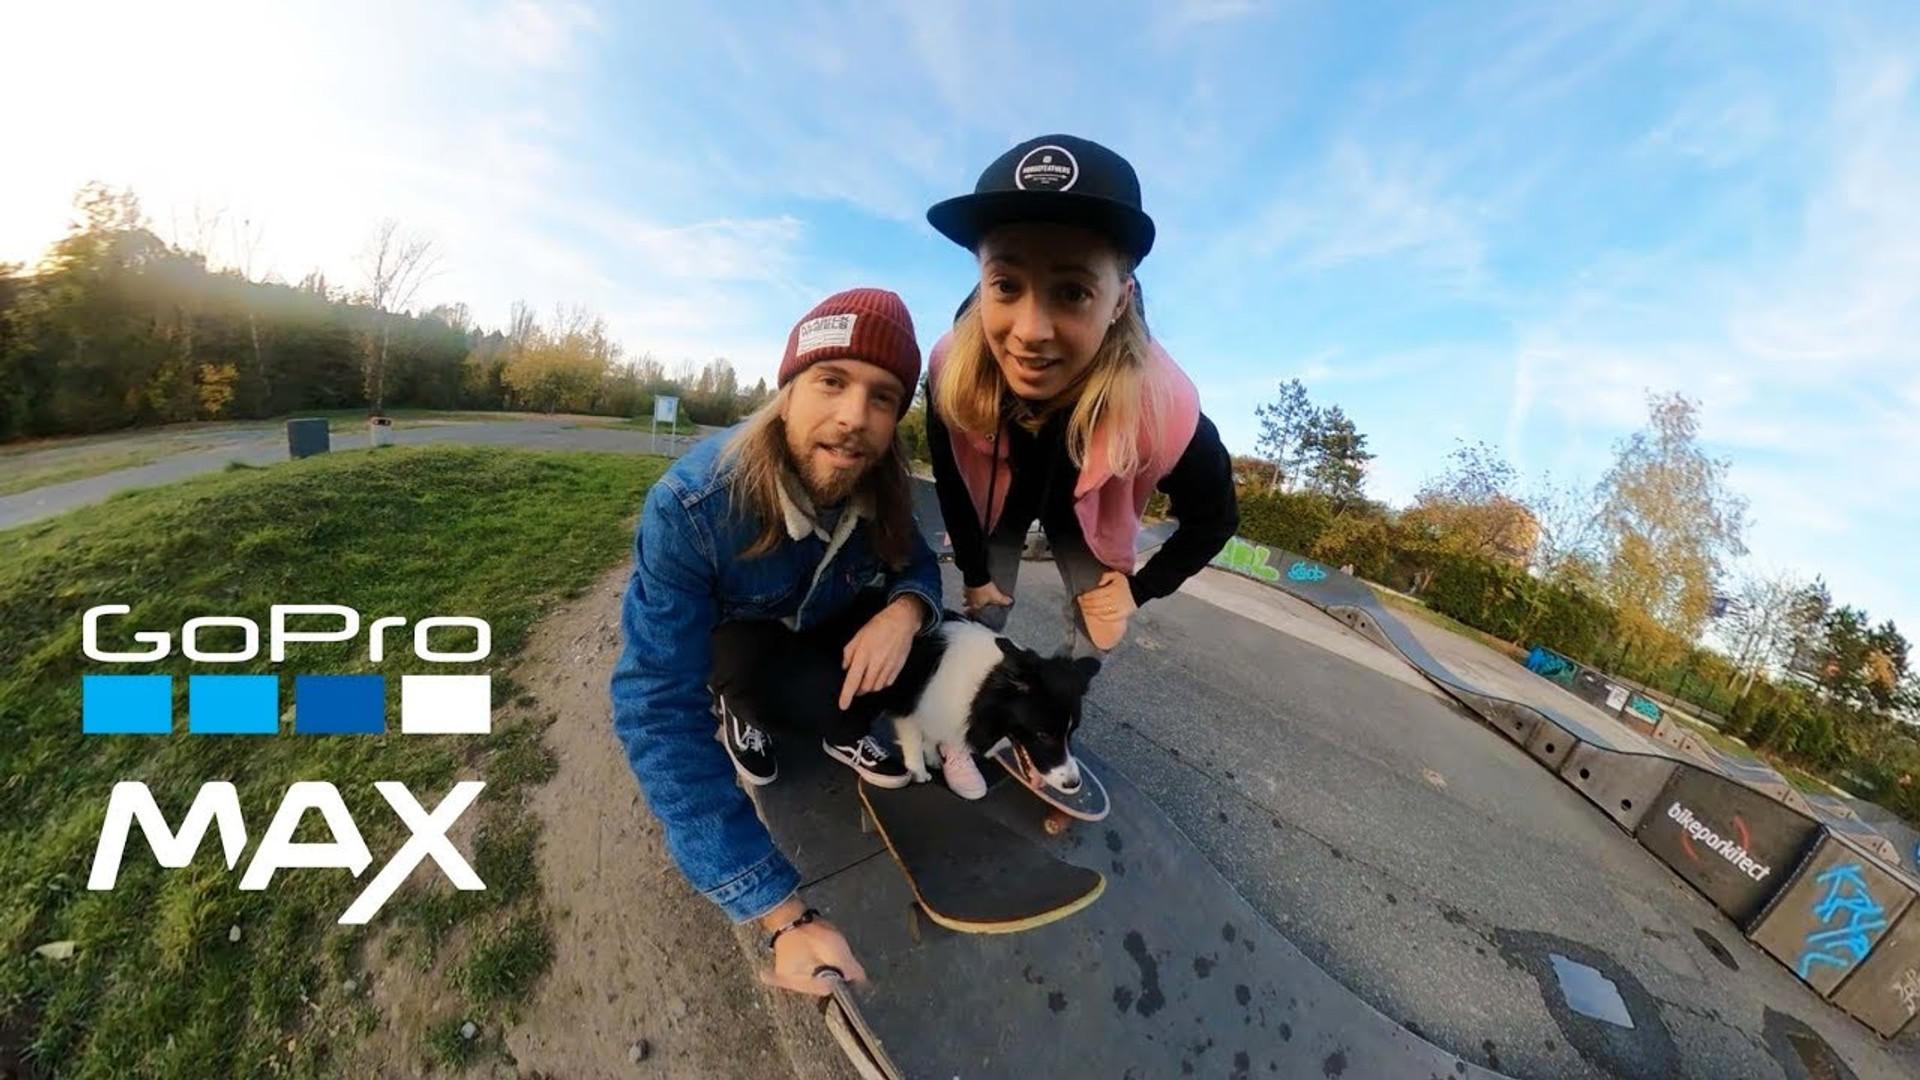 GoPro MAX 360 - first test